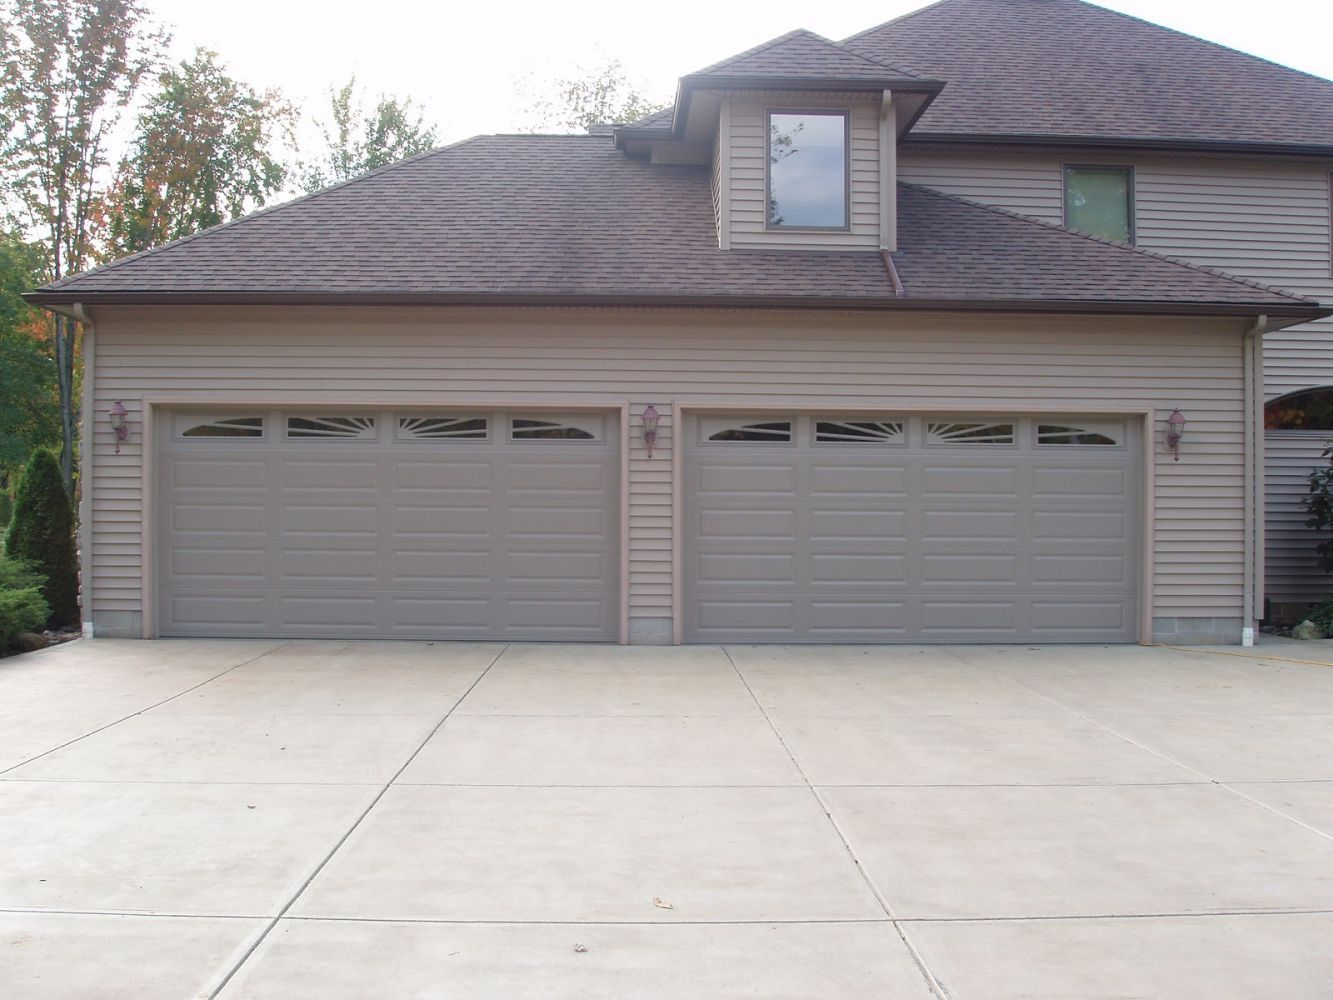 Residental garage door repairs columbia station oh for Garage door repair